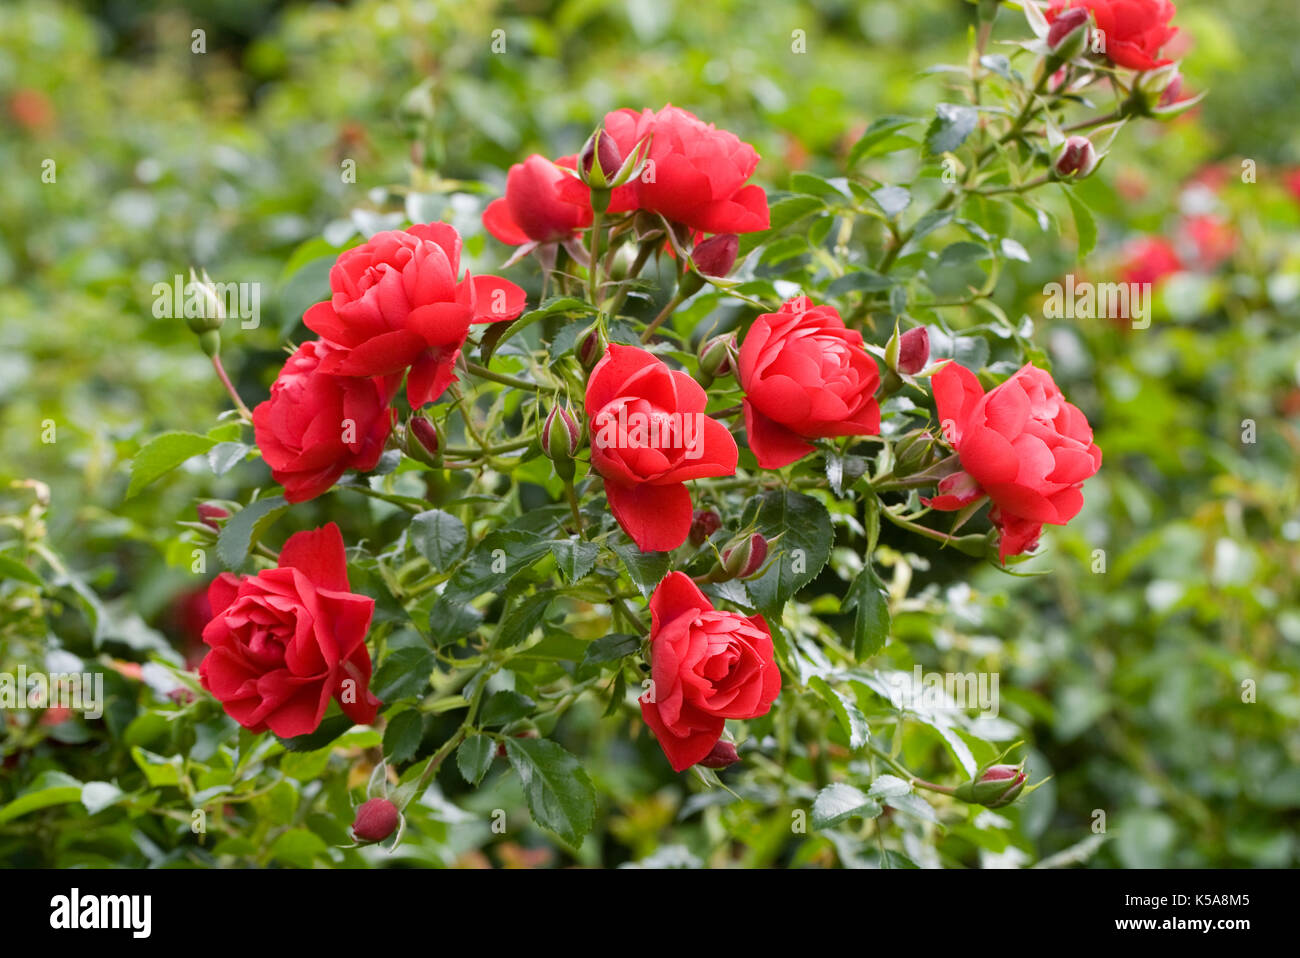 Scarlet Flower Heads Stock Photos & Scarlet Flower Heads